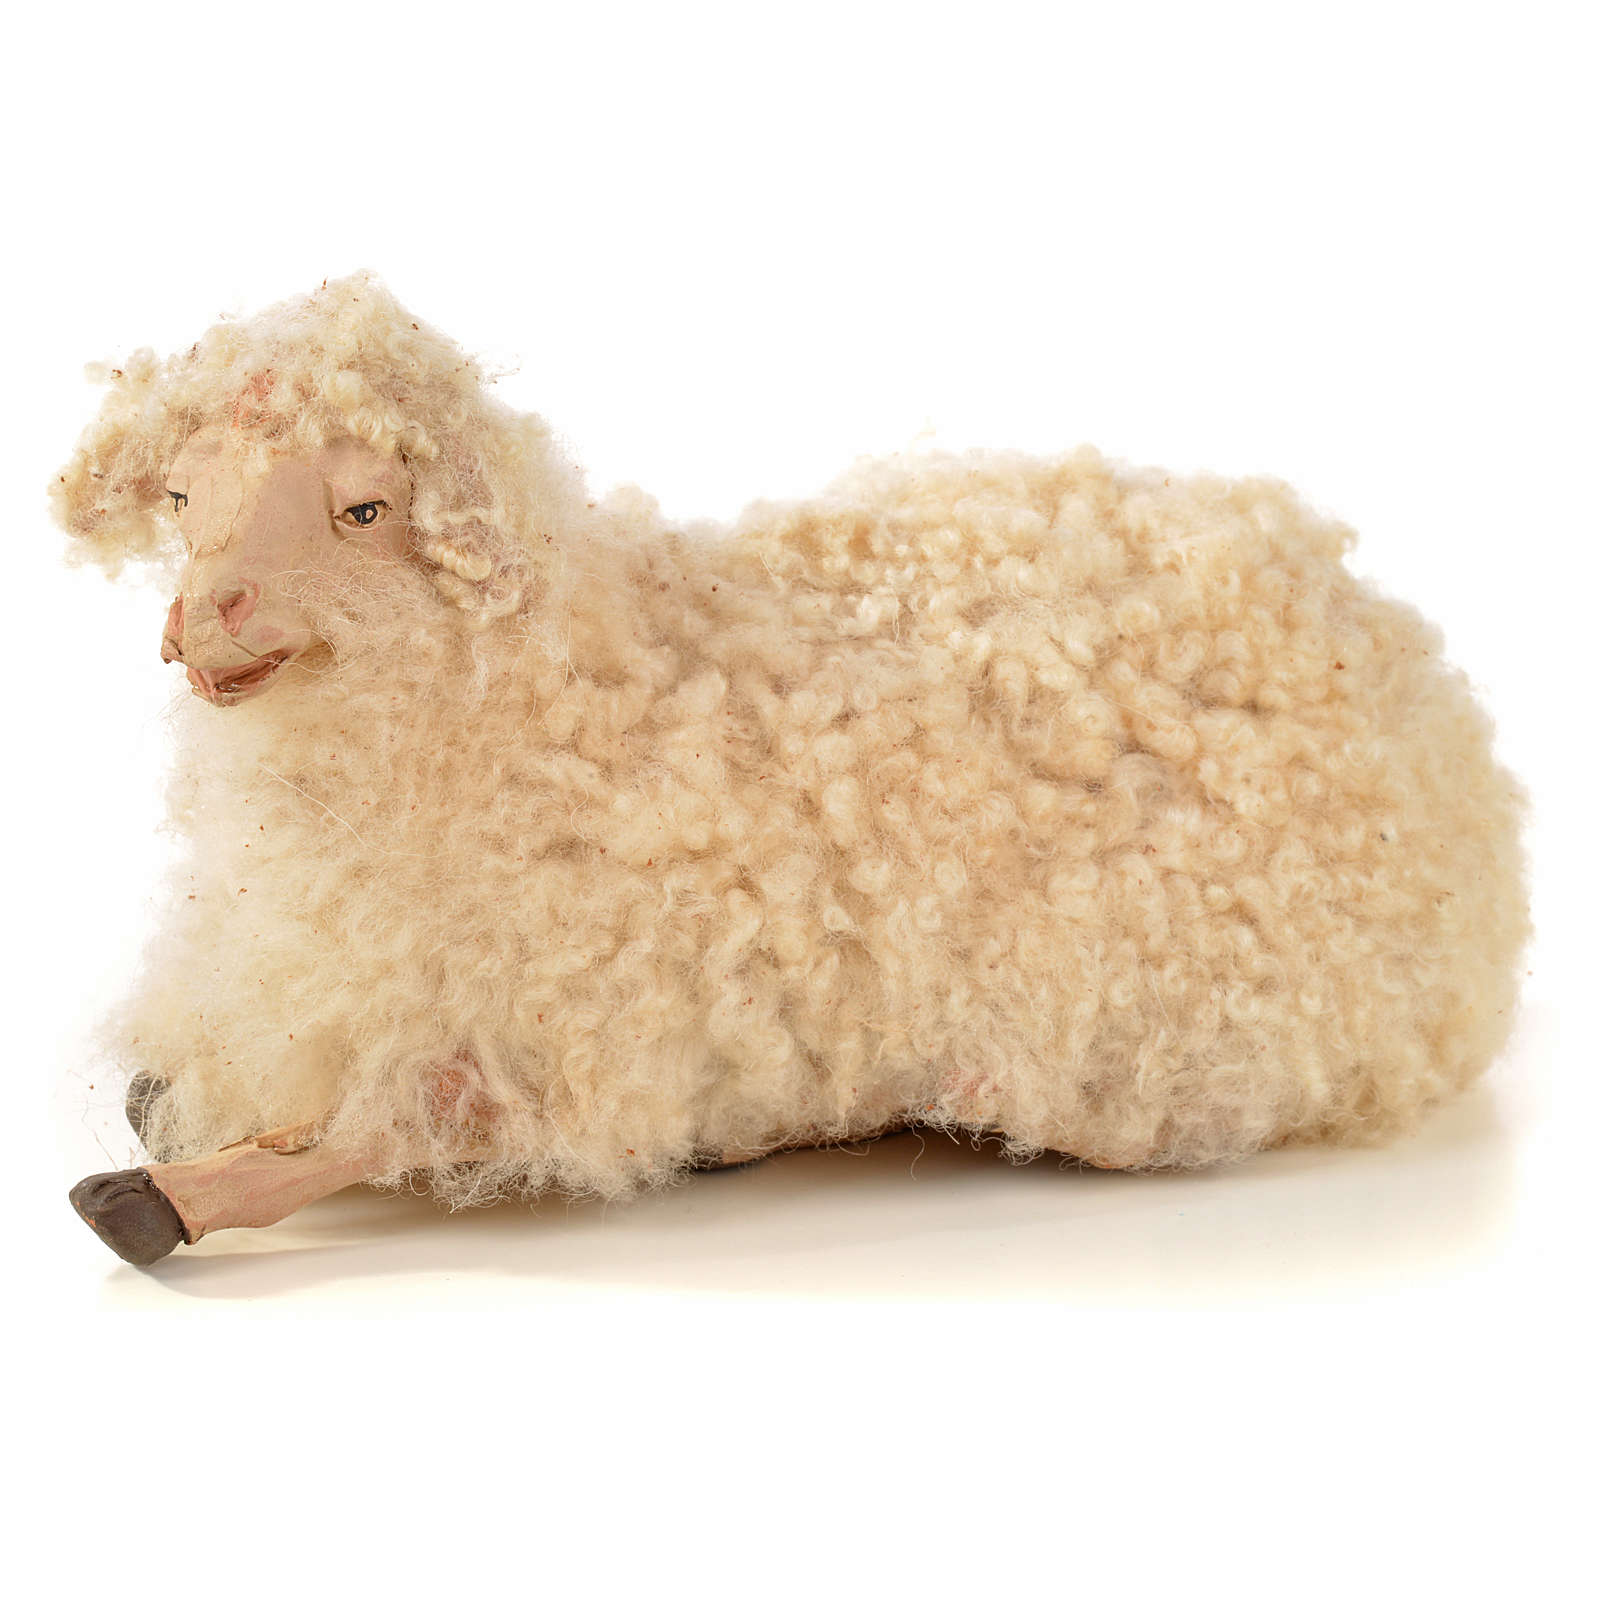 Kit 3 pecore con lana 22 cm presepe napoletano 4